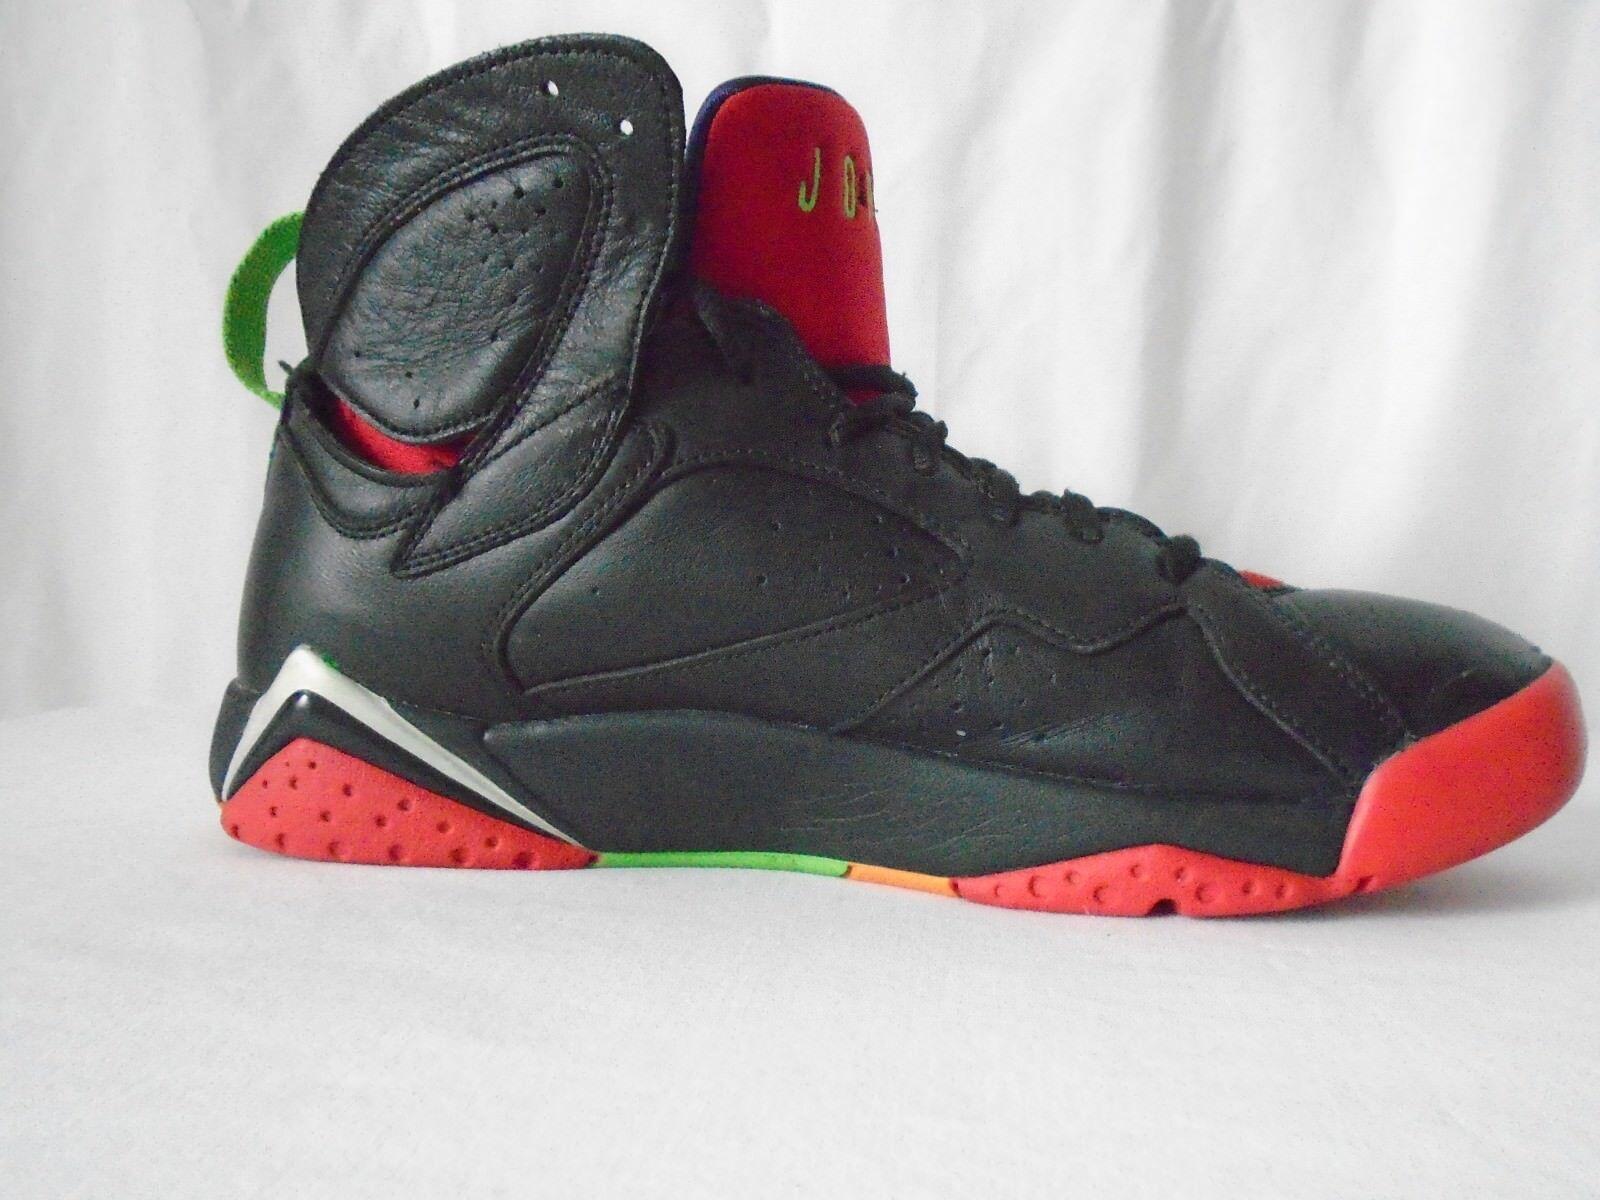 Nike Air Jordan mens size 10 black red shoe 7 vii retro marvin the martian